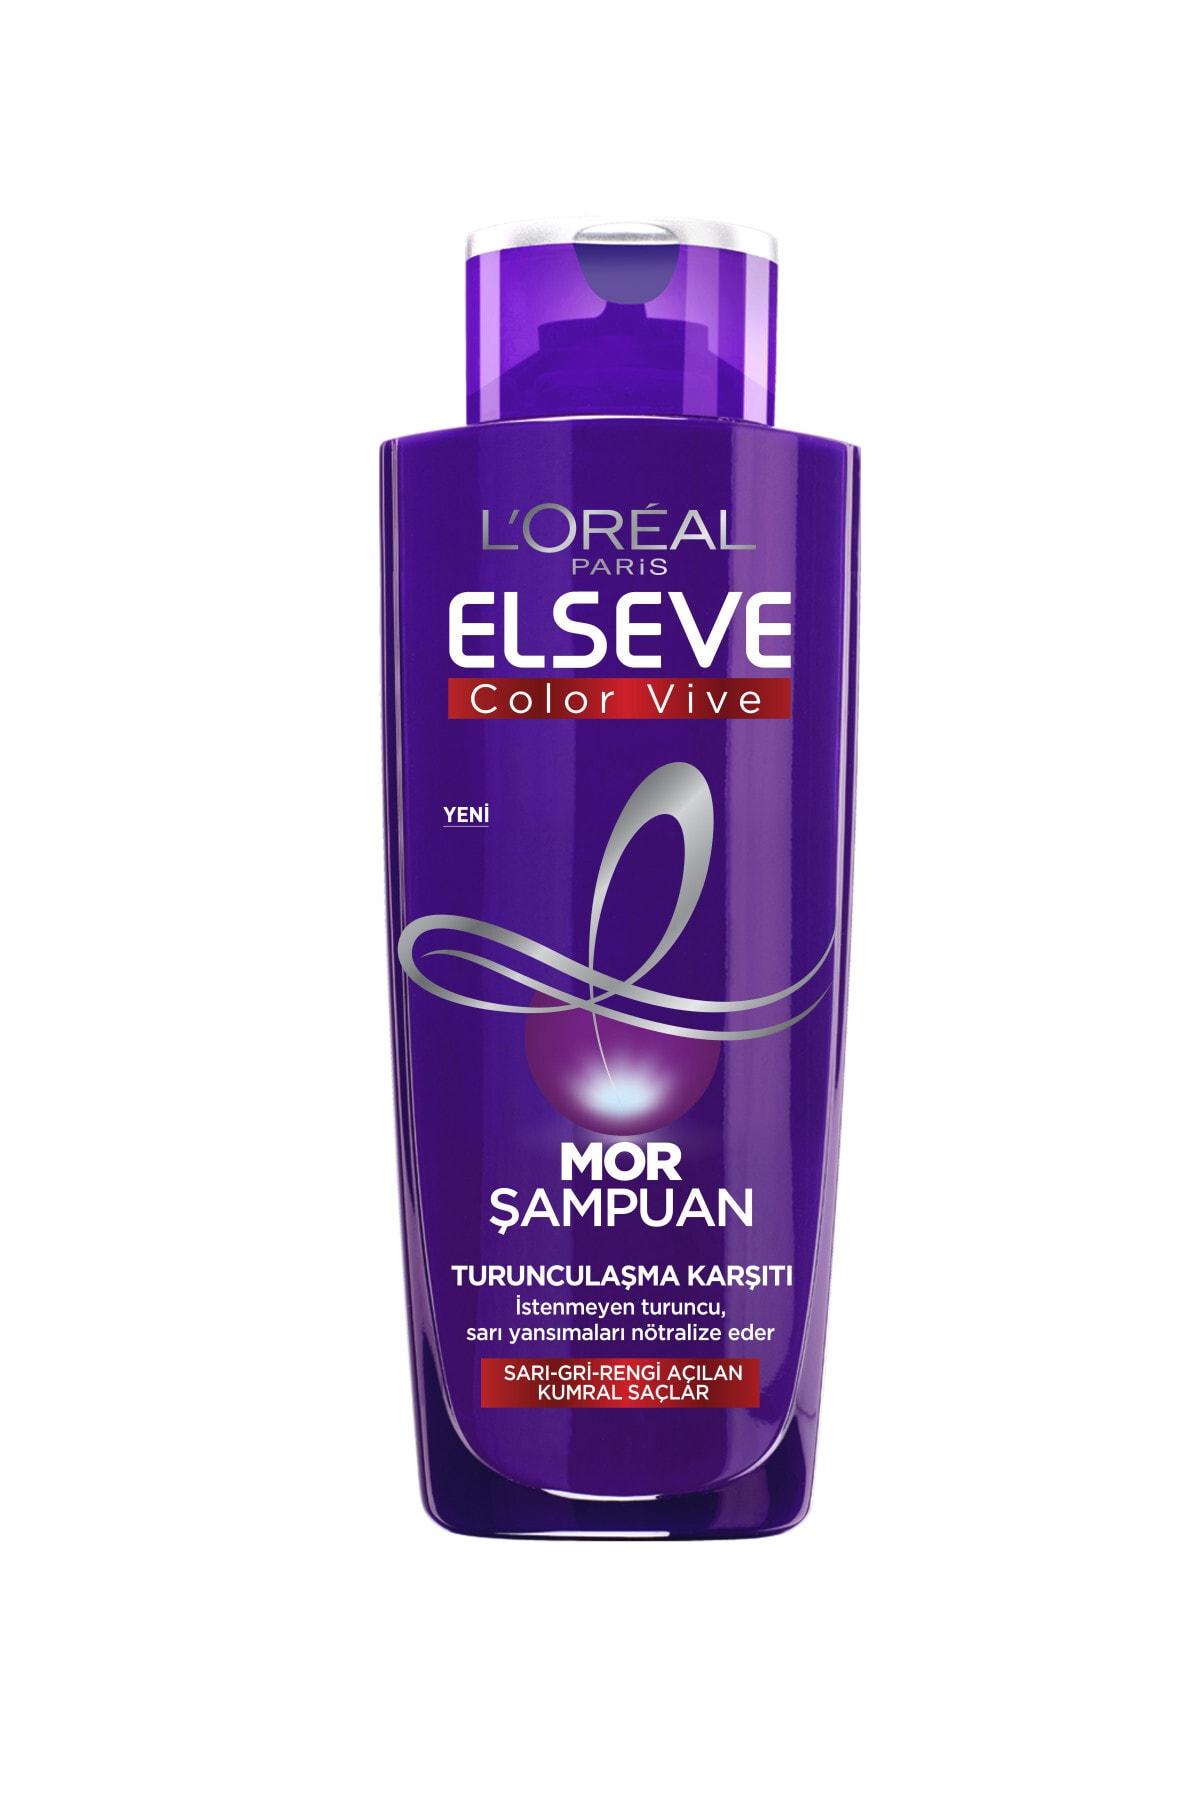 ELSEVE L'oréal Paris Elseve Turunculaşma Karşıtı Mor Şampuan 200ml 2